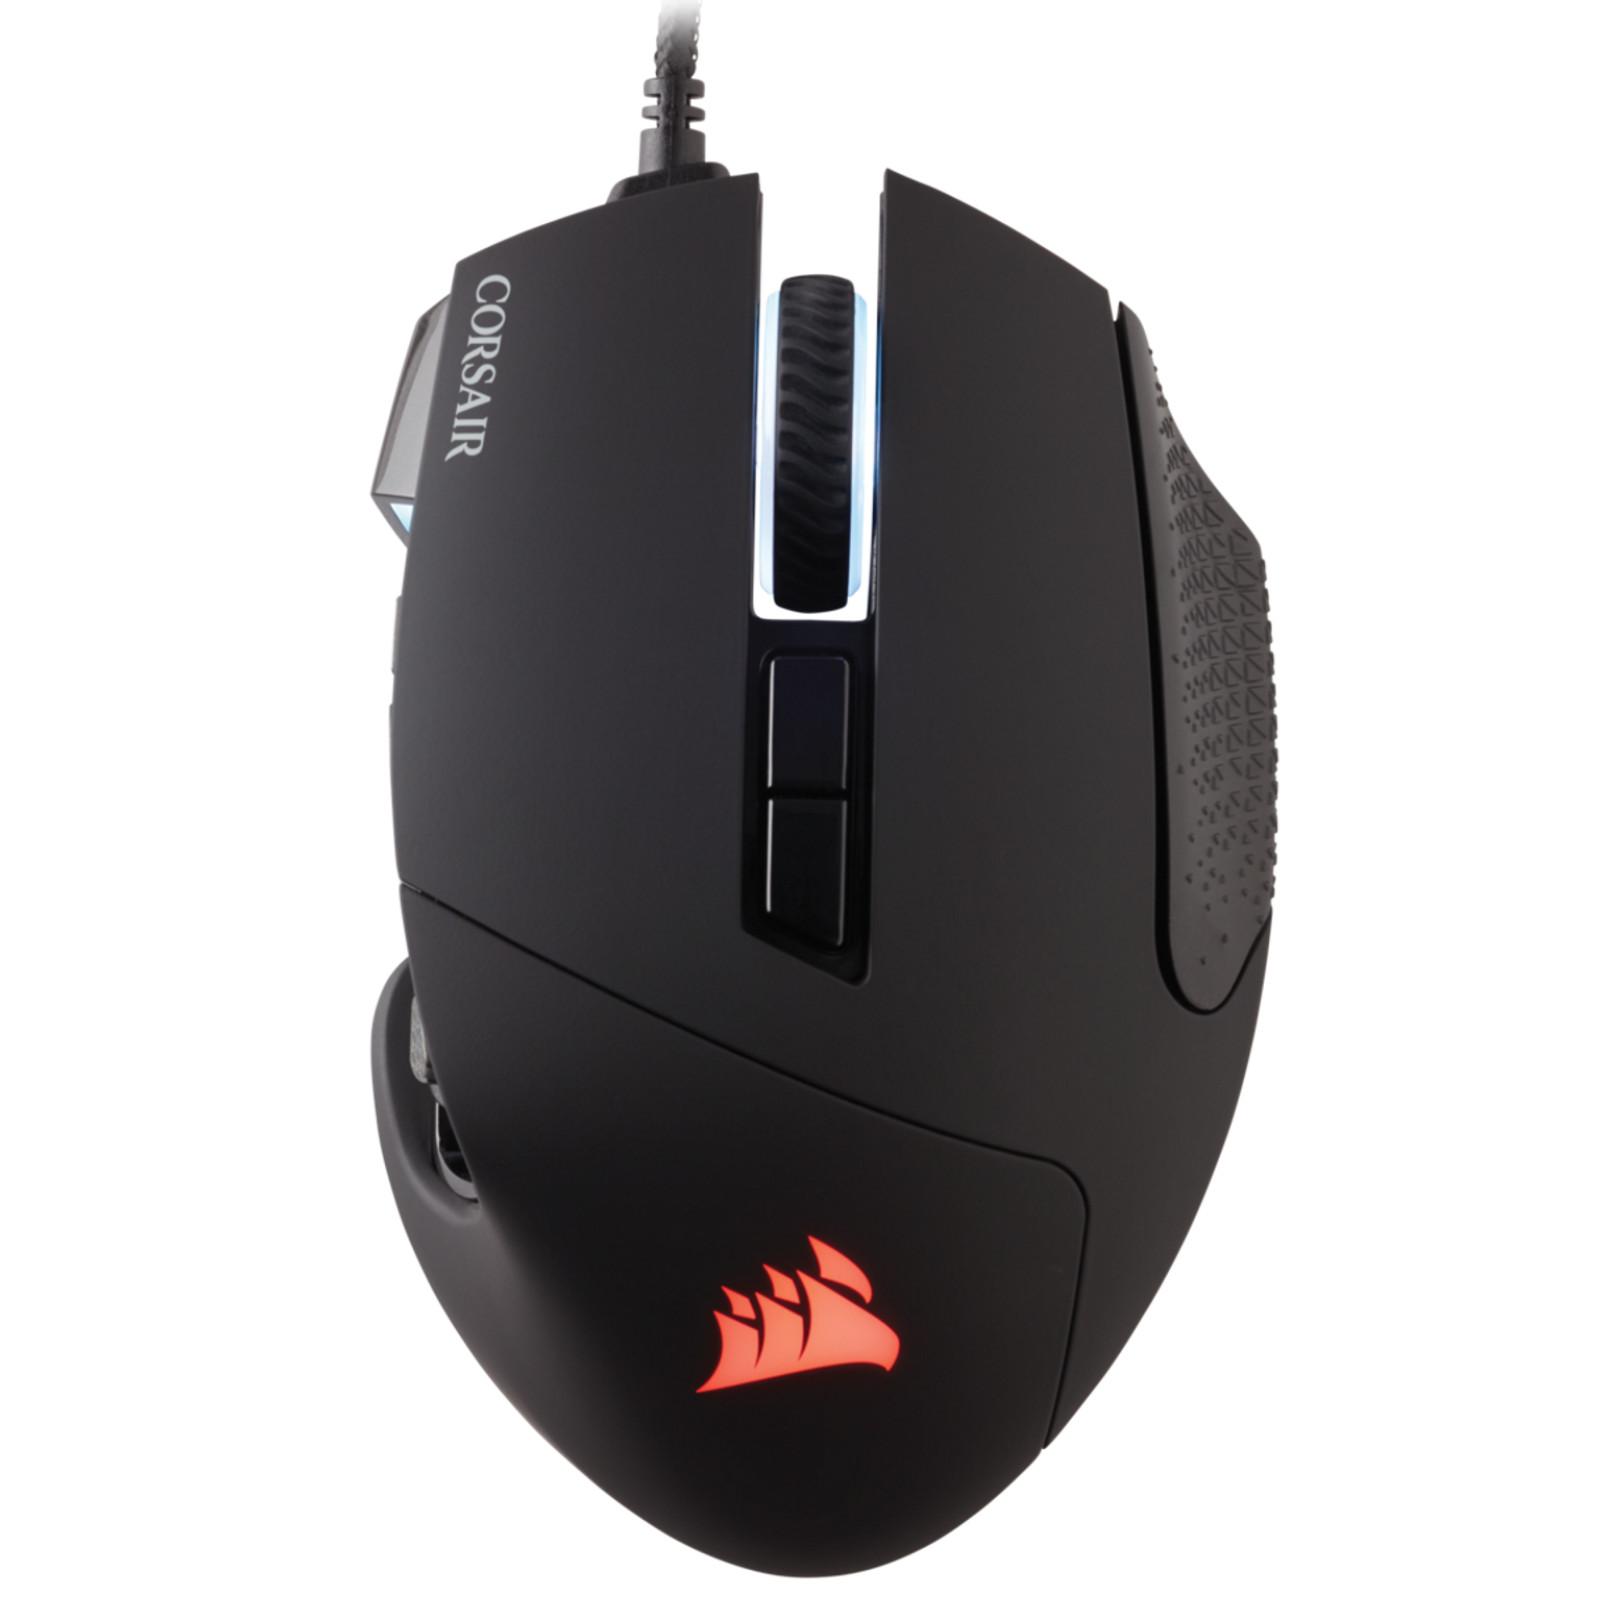 405fada3918 Corsair Scimitar Pro B Gaming Mouse RGB - 16000 DPI MOBA/MMO Optical - Black